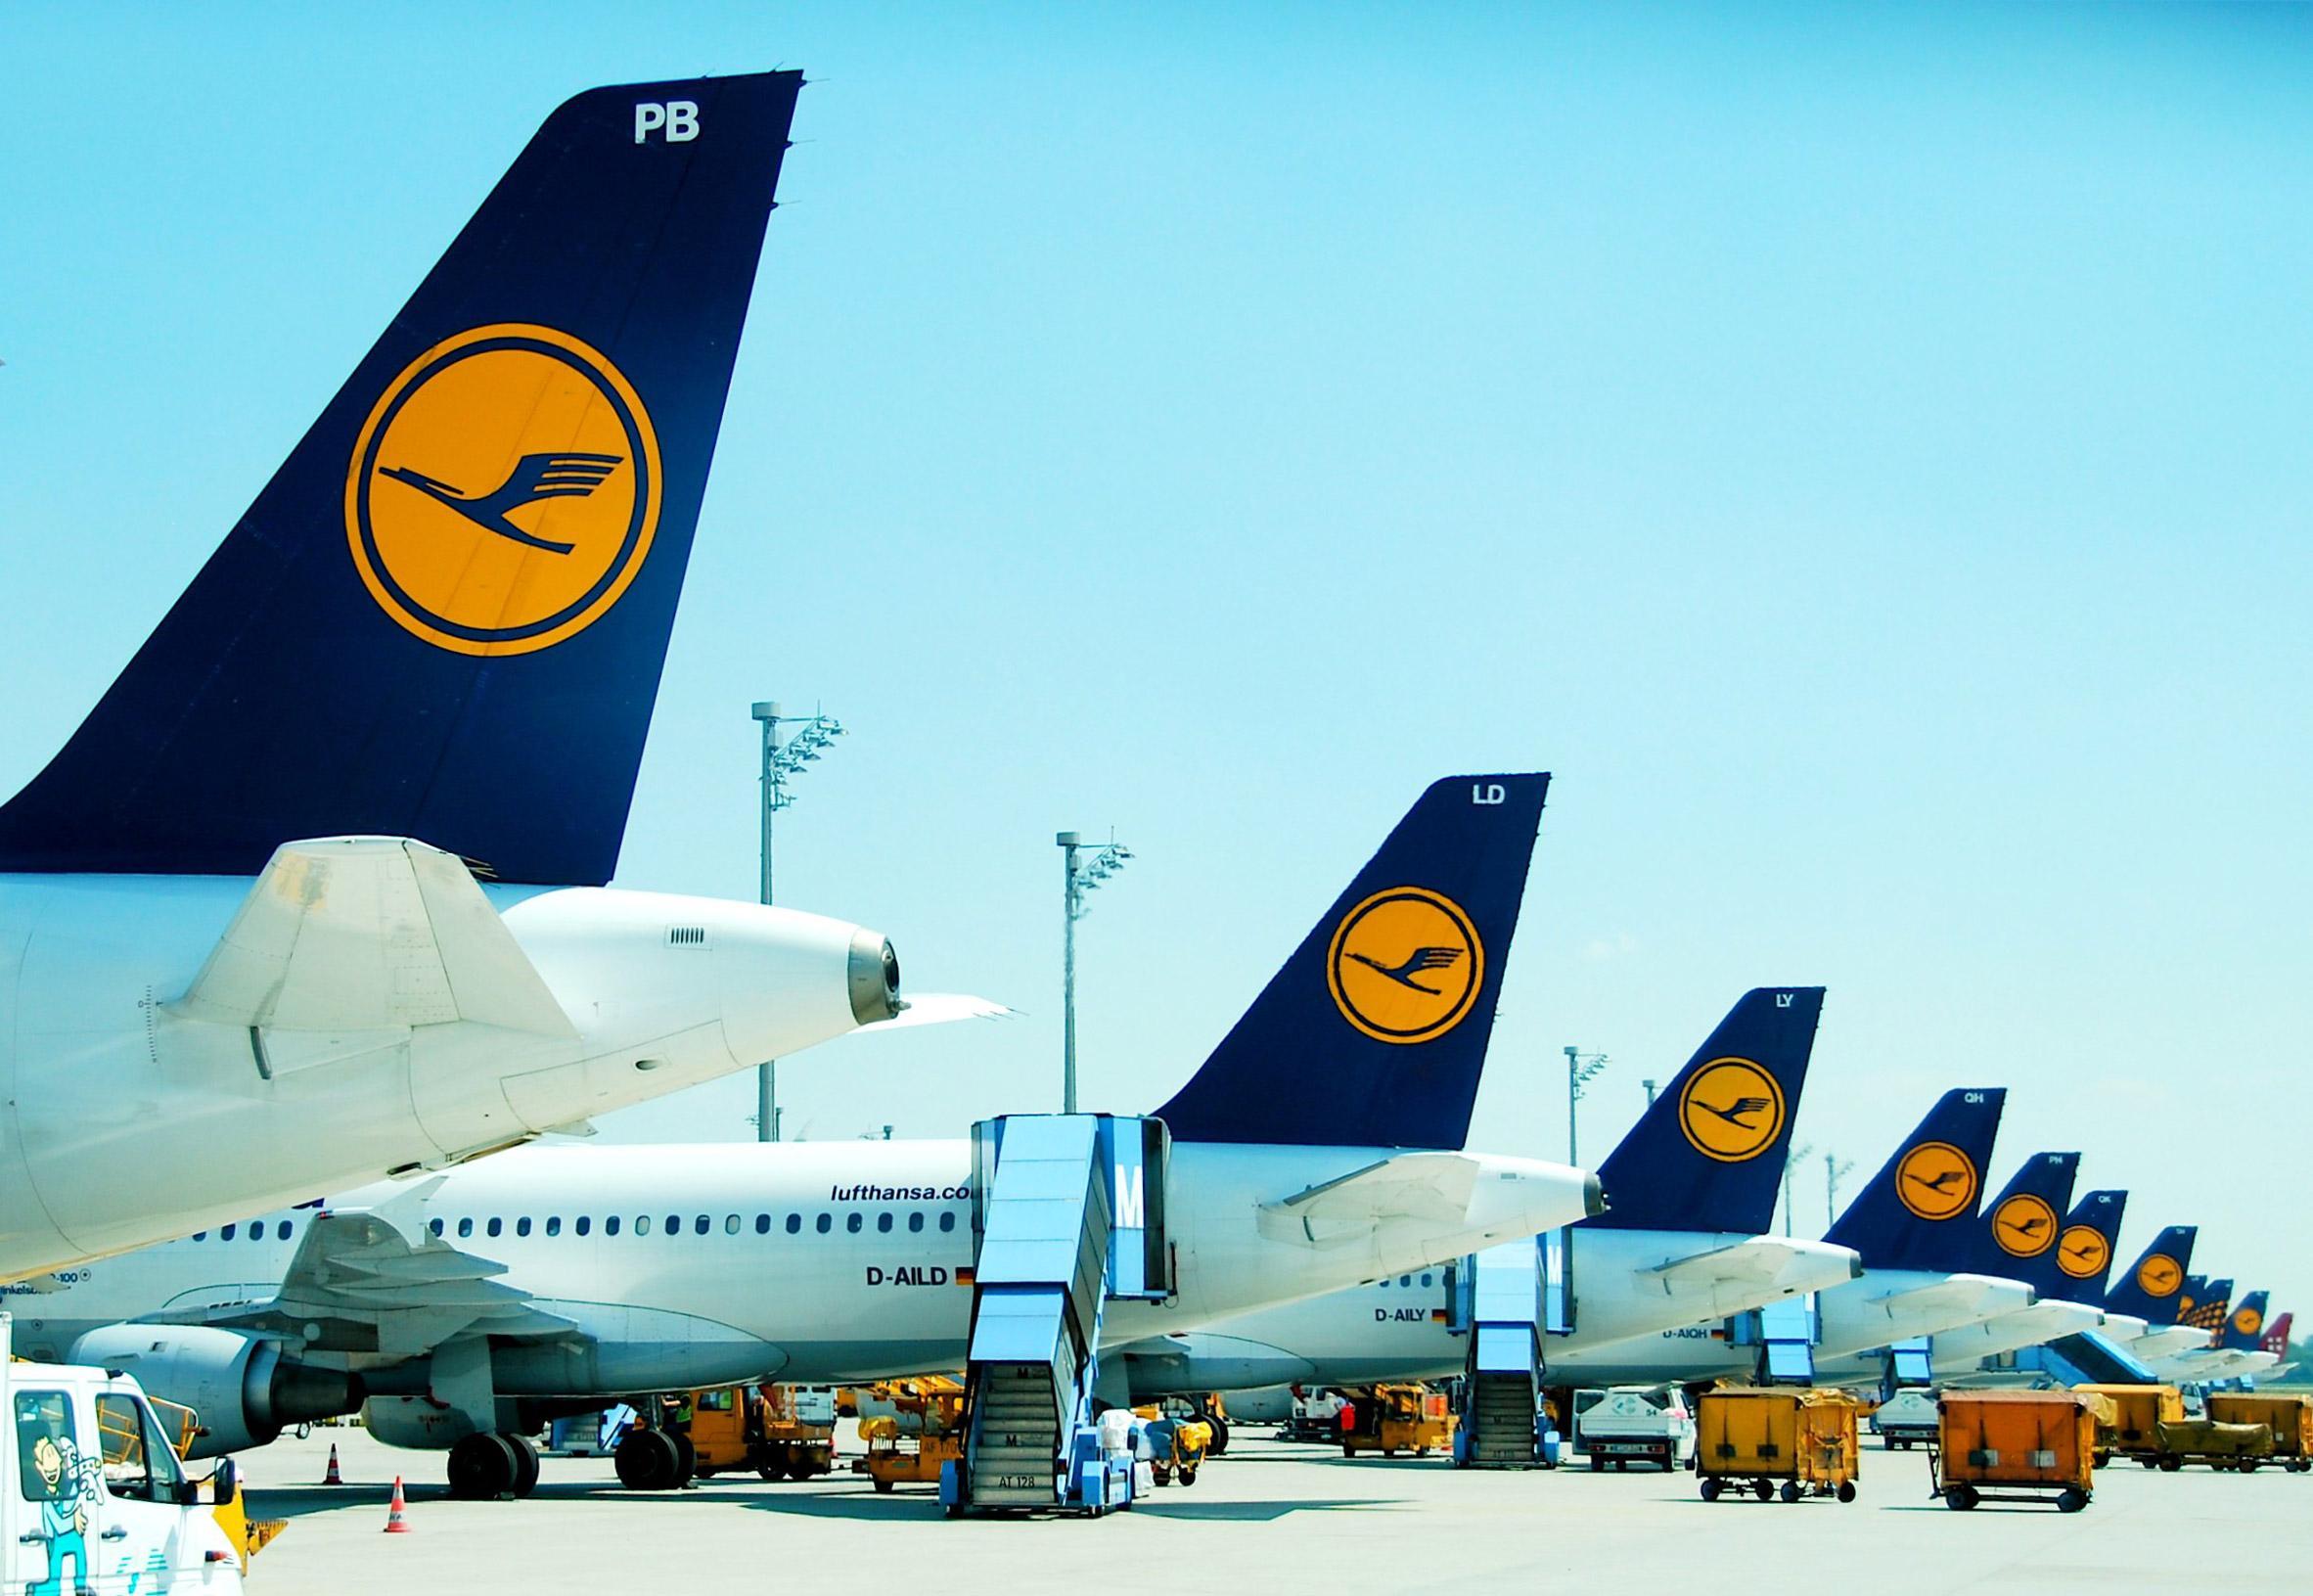 Lufthansa logo before its 2018 rebrand